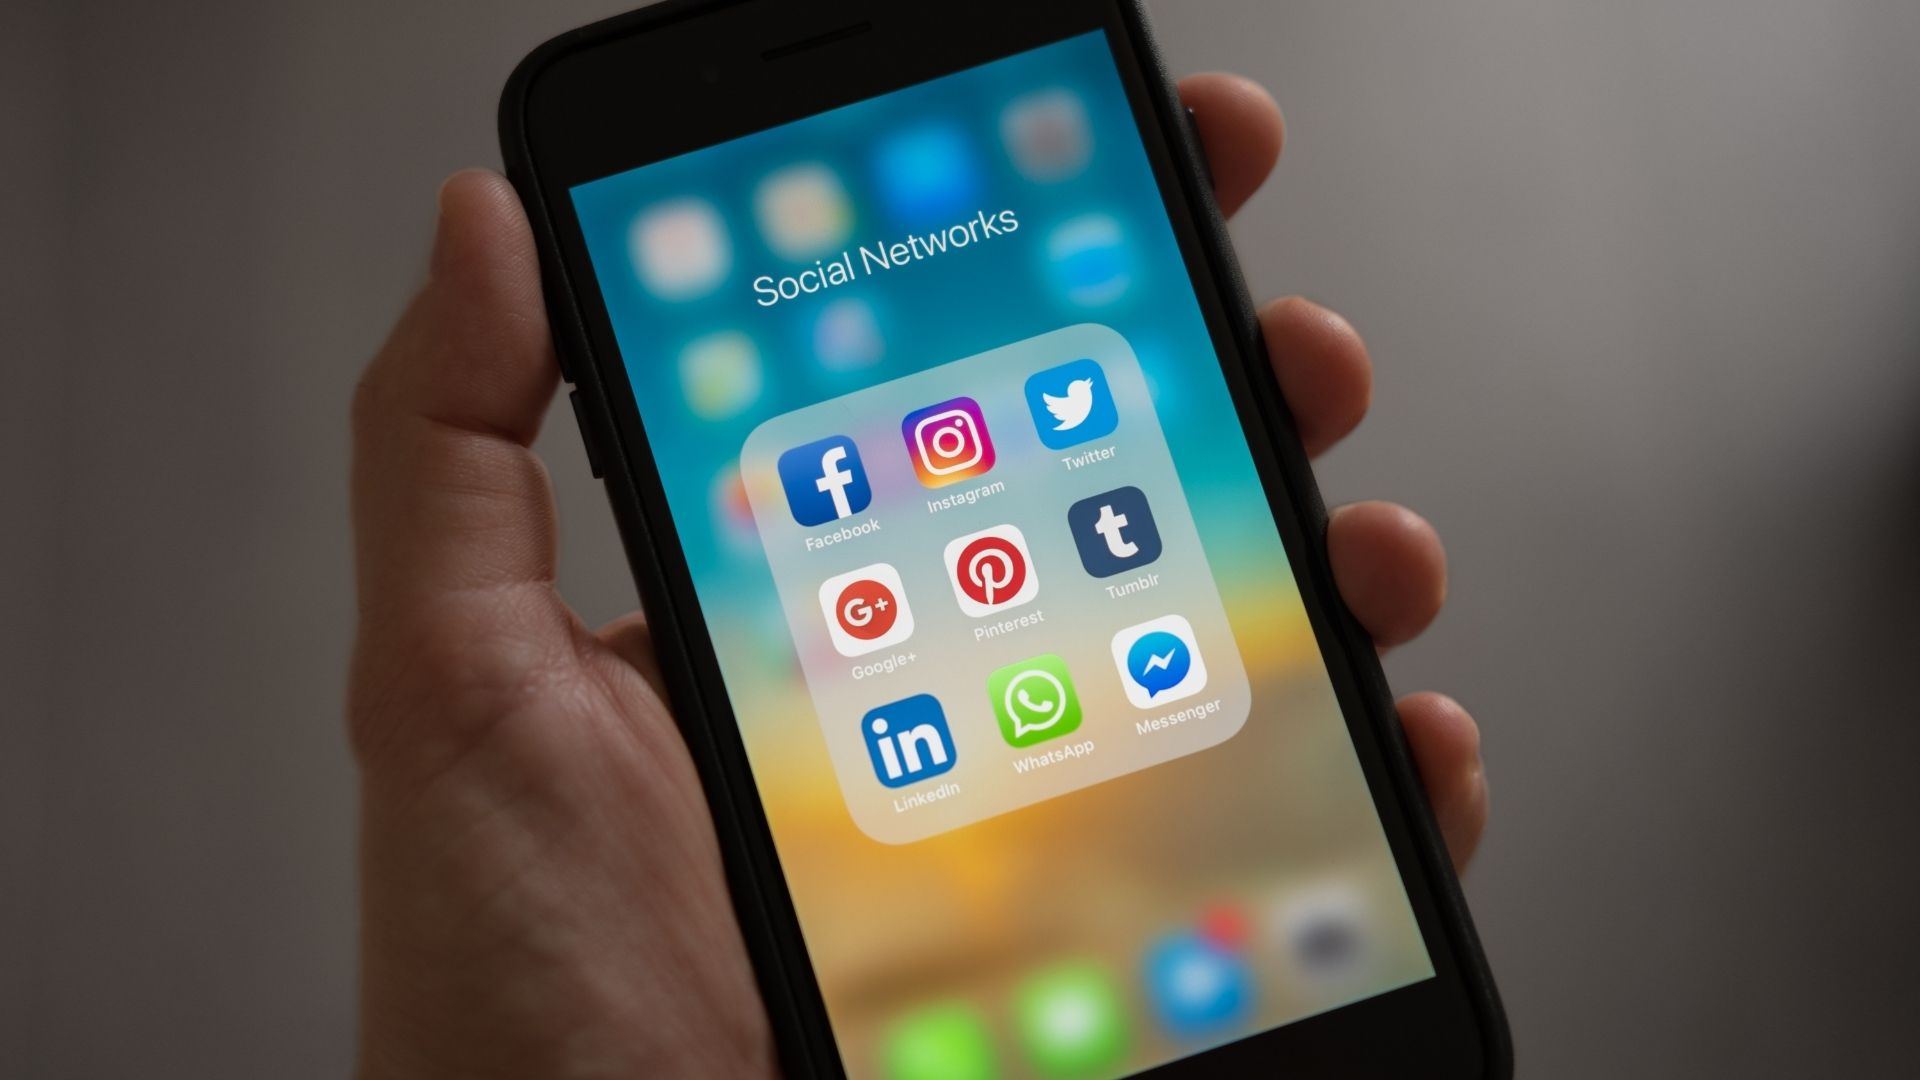 International Diploma in Internet & Social Media Marketing – Διεθνές Δίπλωμα στο Διαδικτυακό Μάρκετινγκ